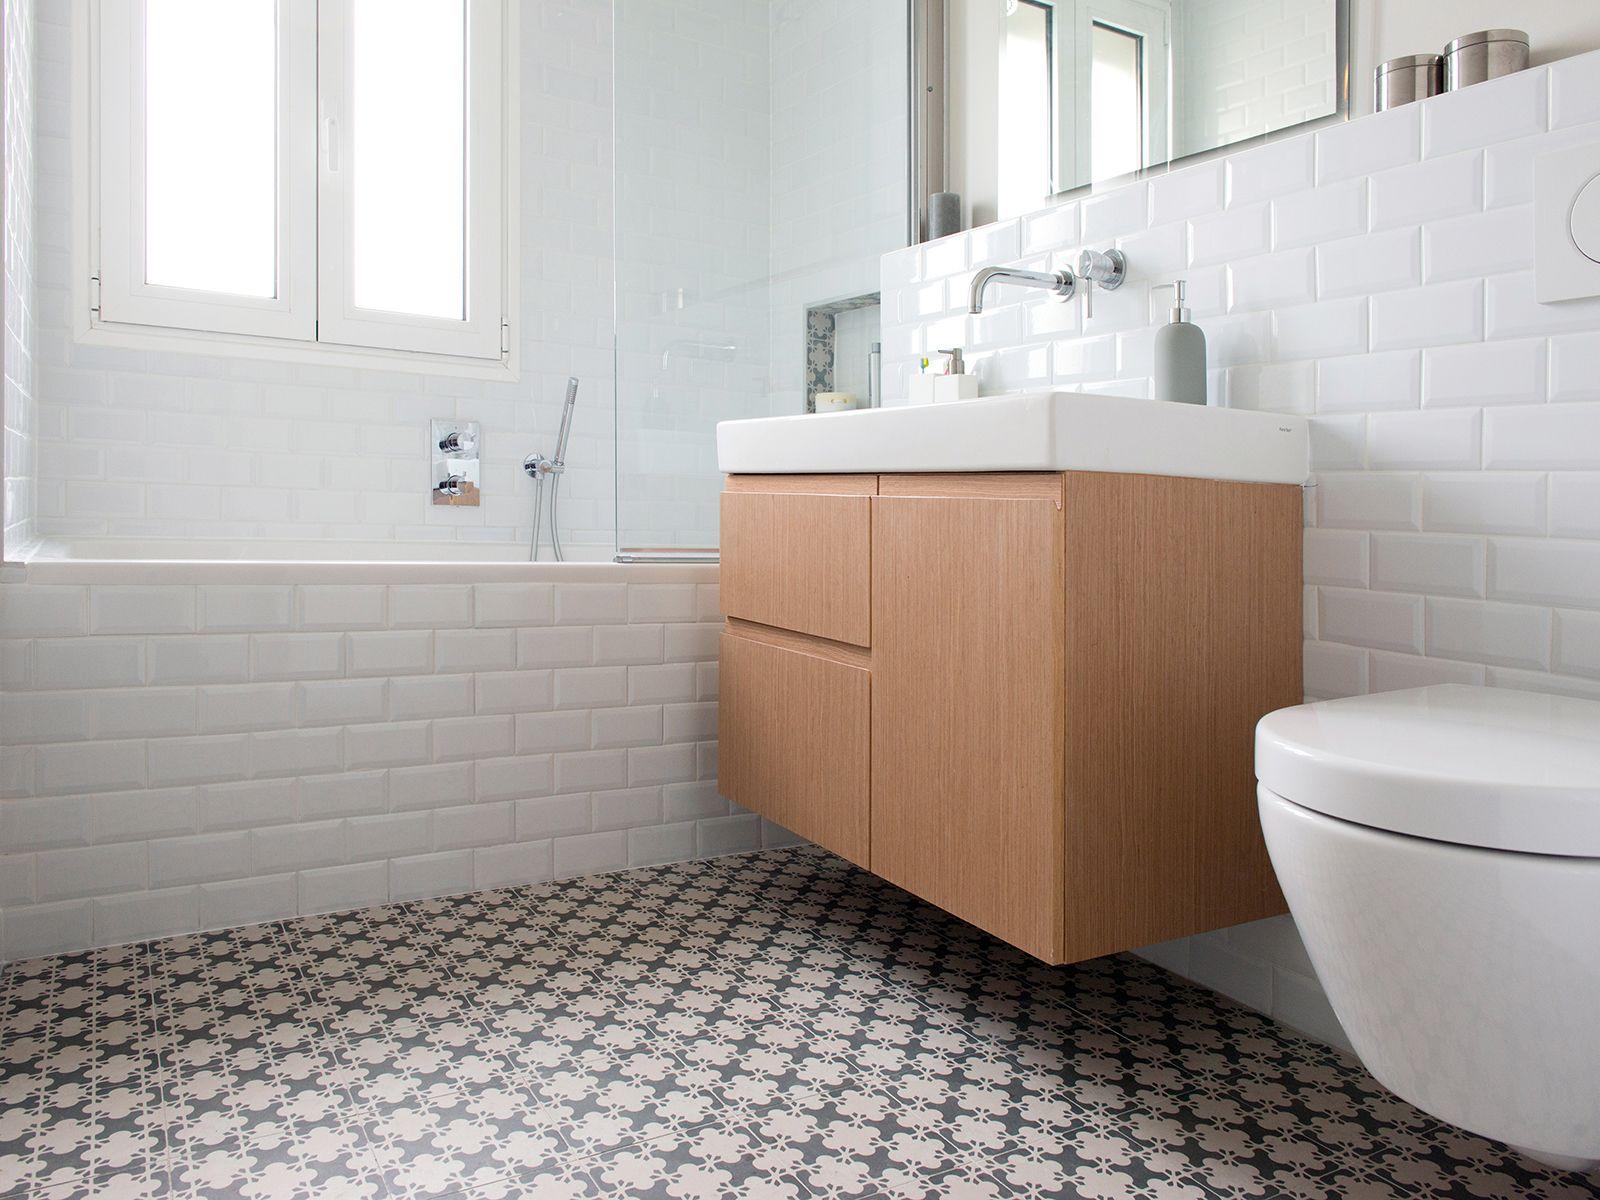 murs et merveilles bath room pinterest. Black Bedroom Furniture Sets. Home Design Ideas